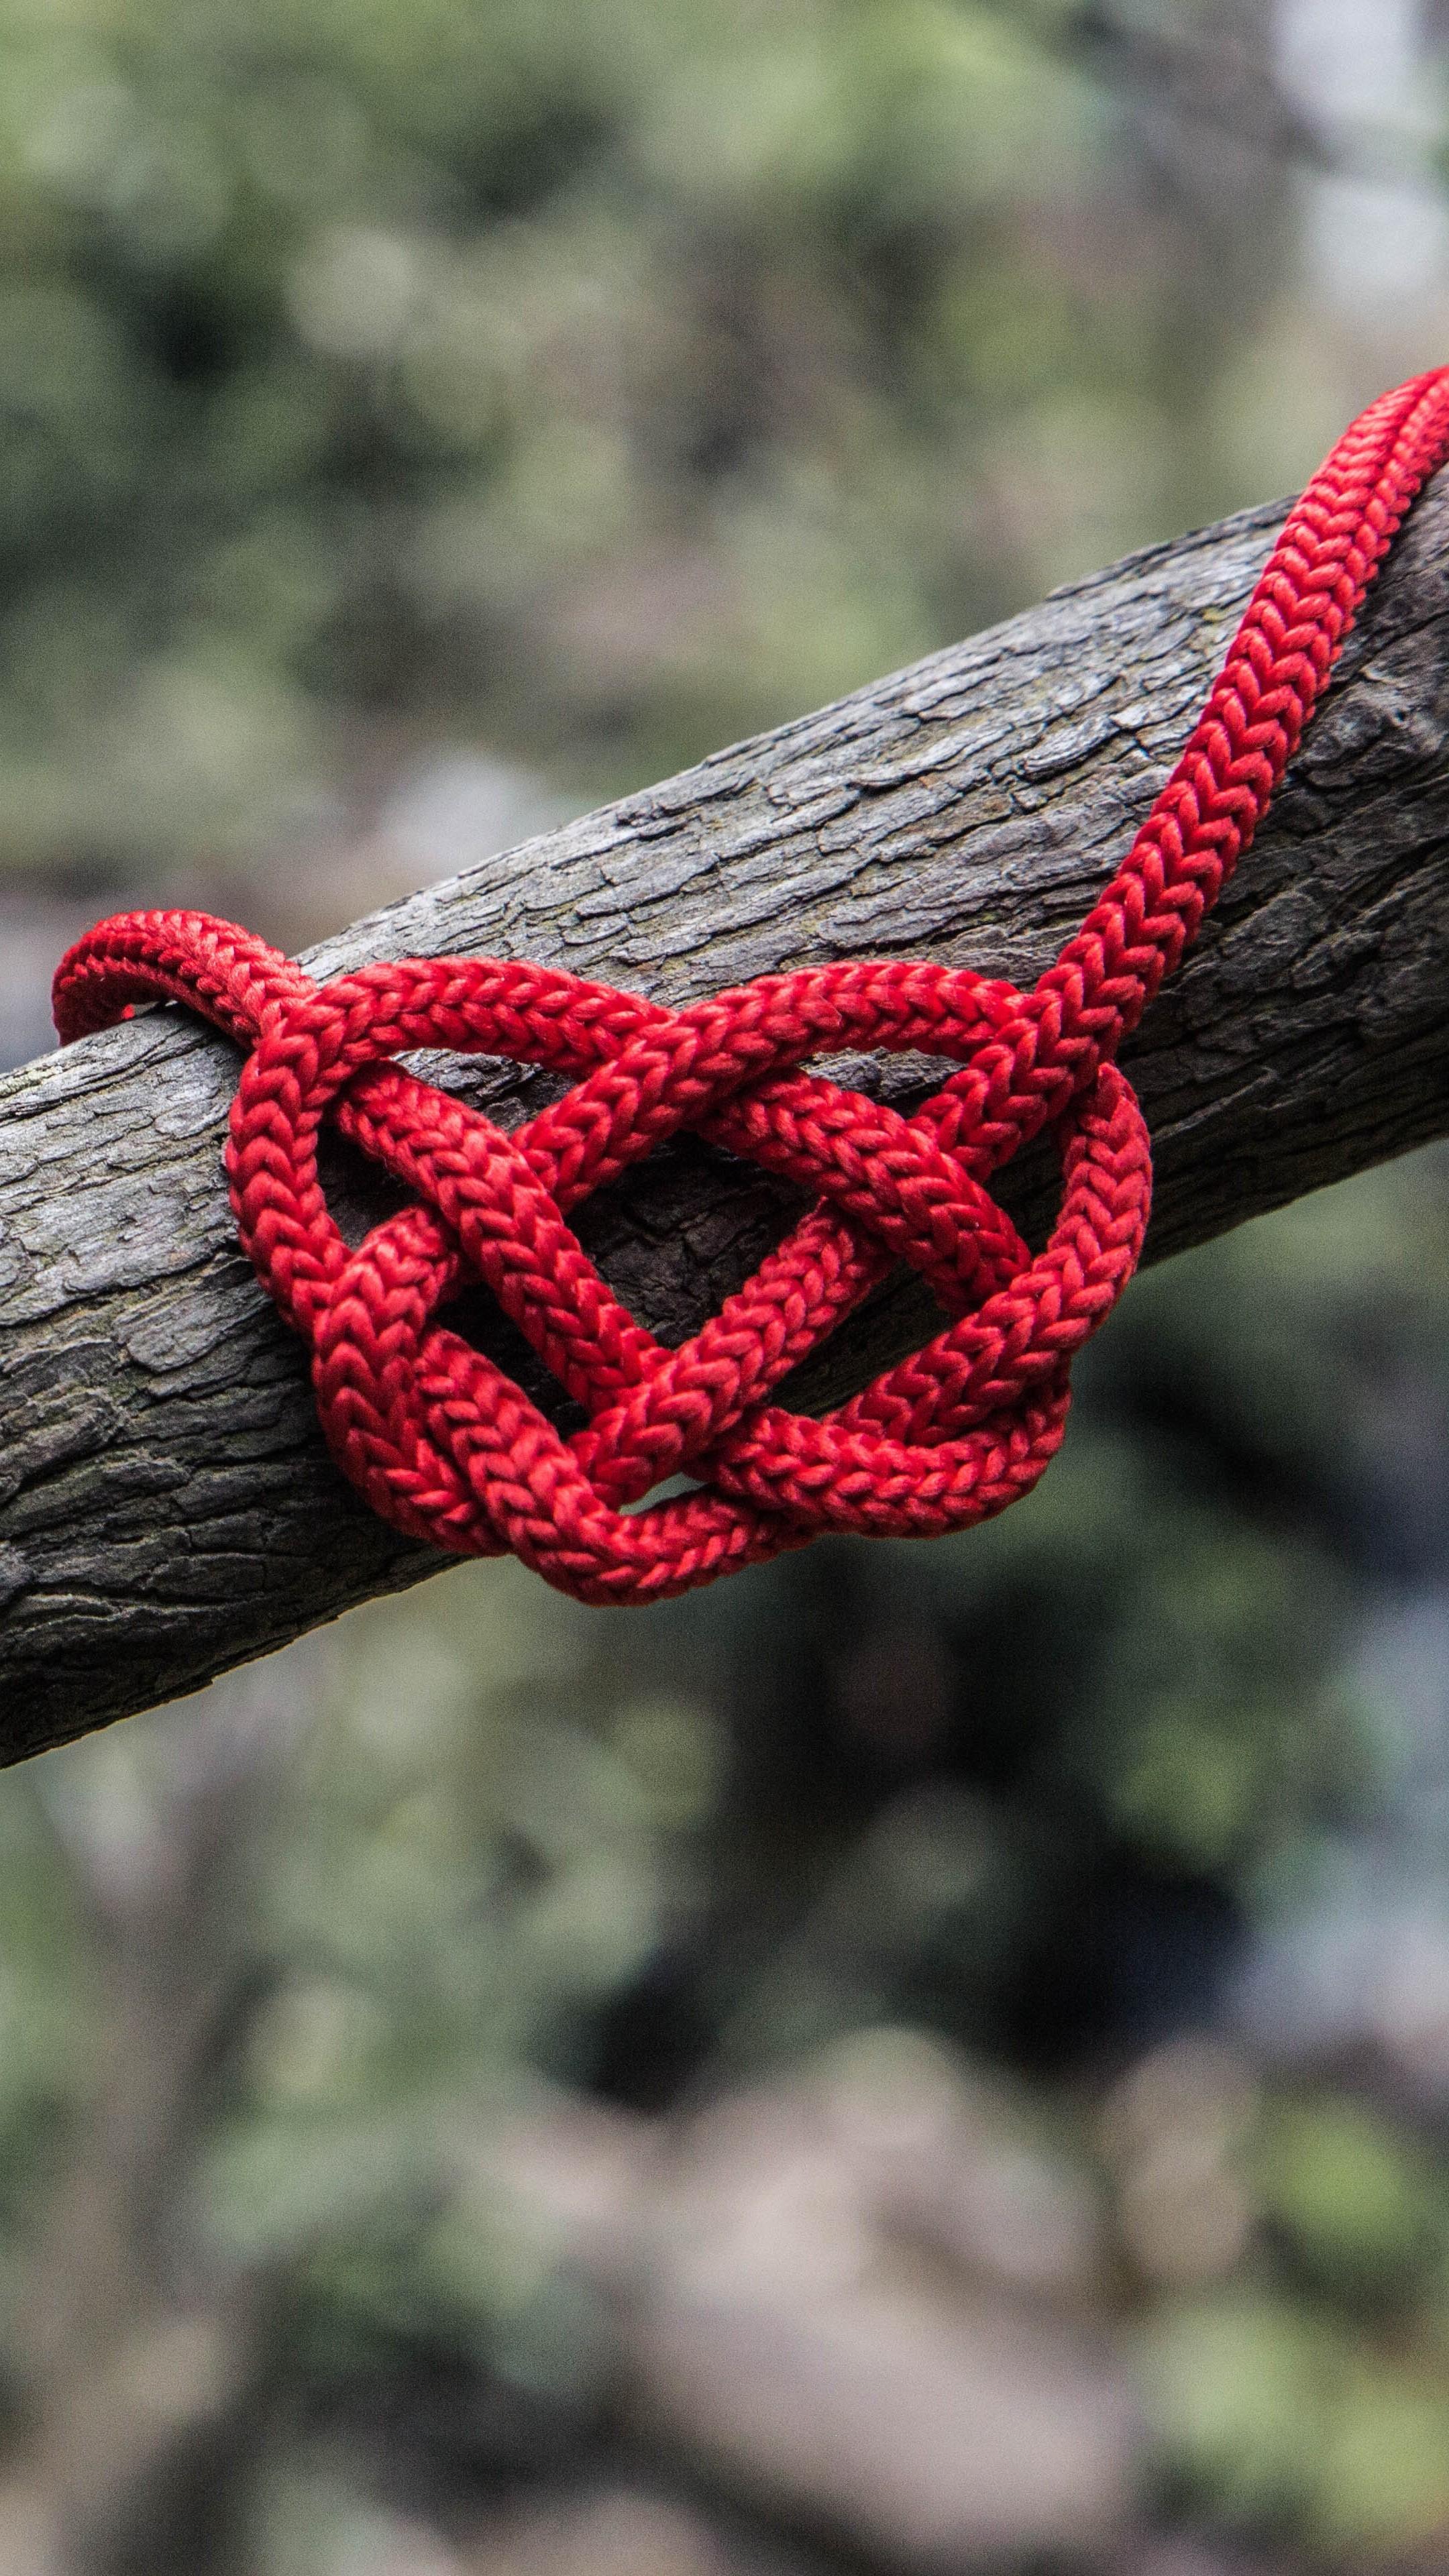 Pubg Iphone X Wallpaper Heart Rope Spelled Tree Wallpaper 2160x3840